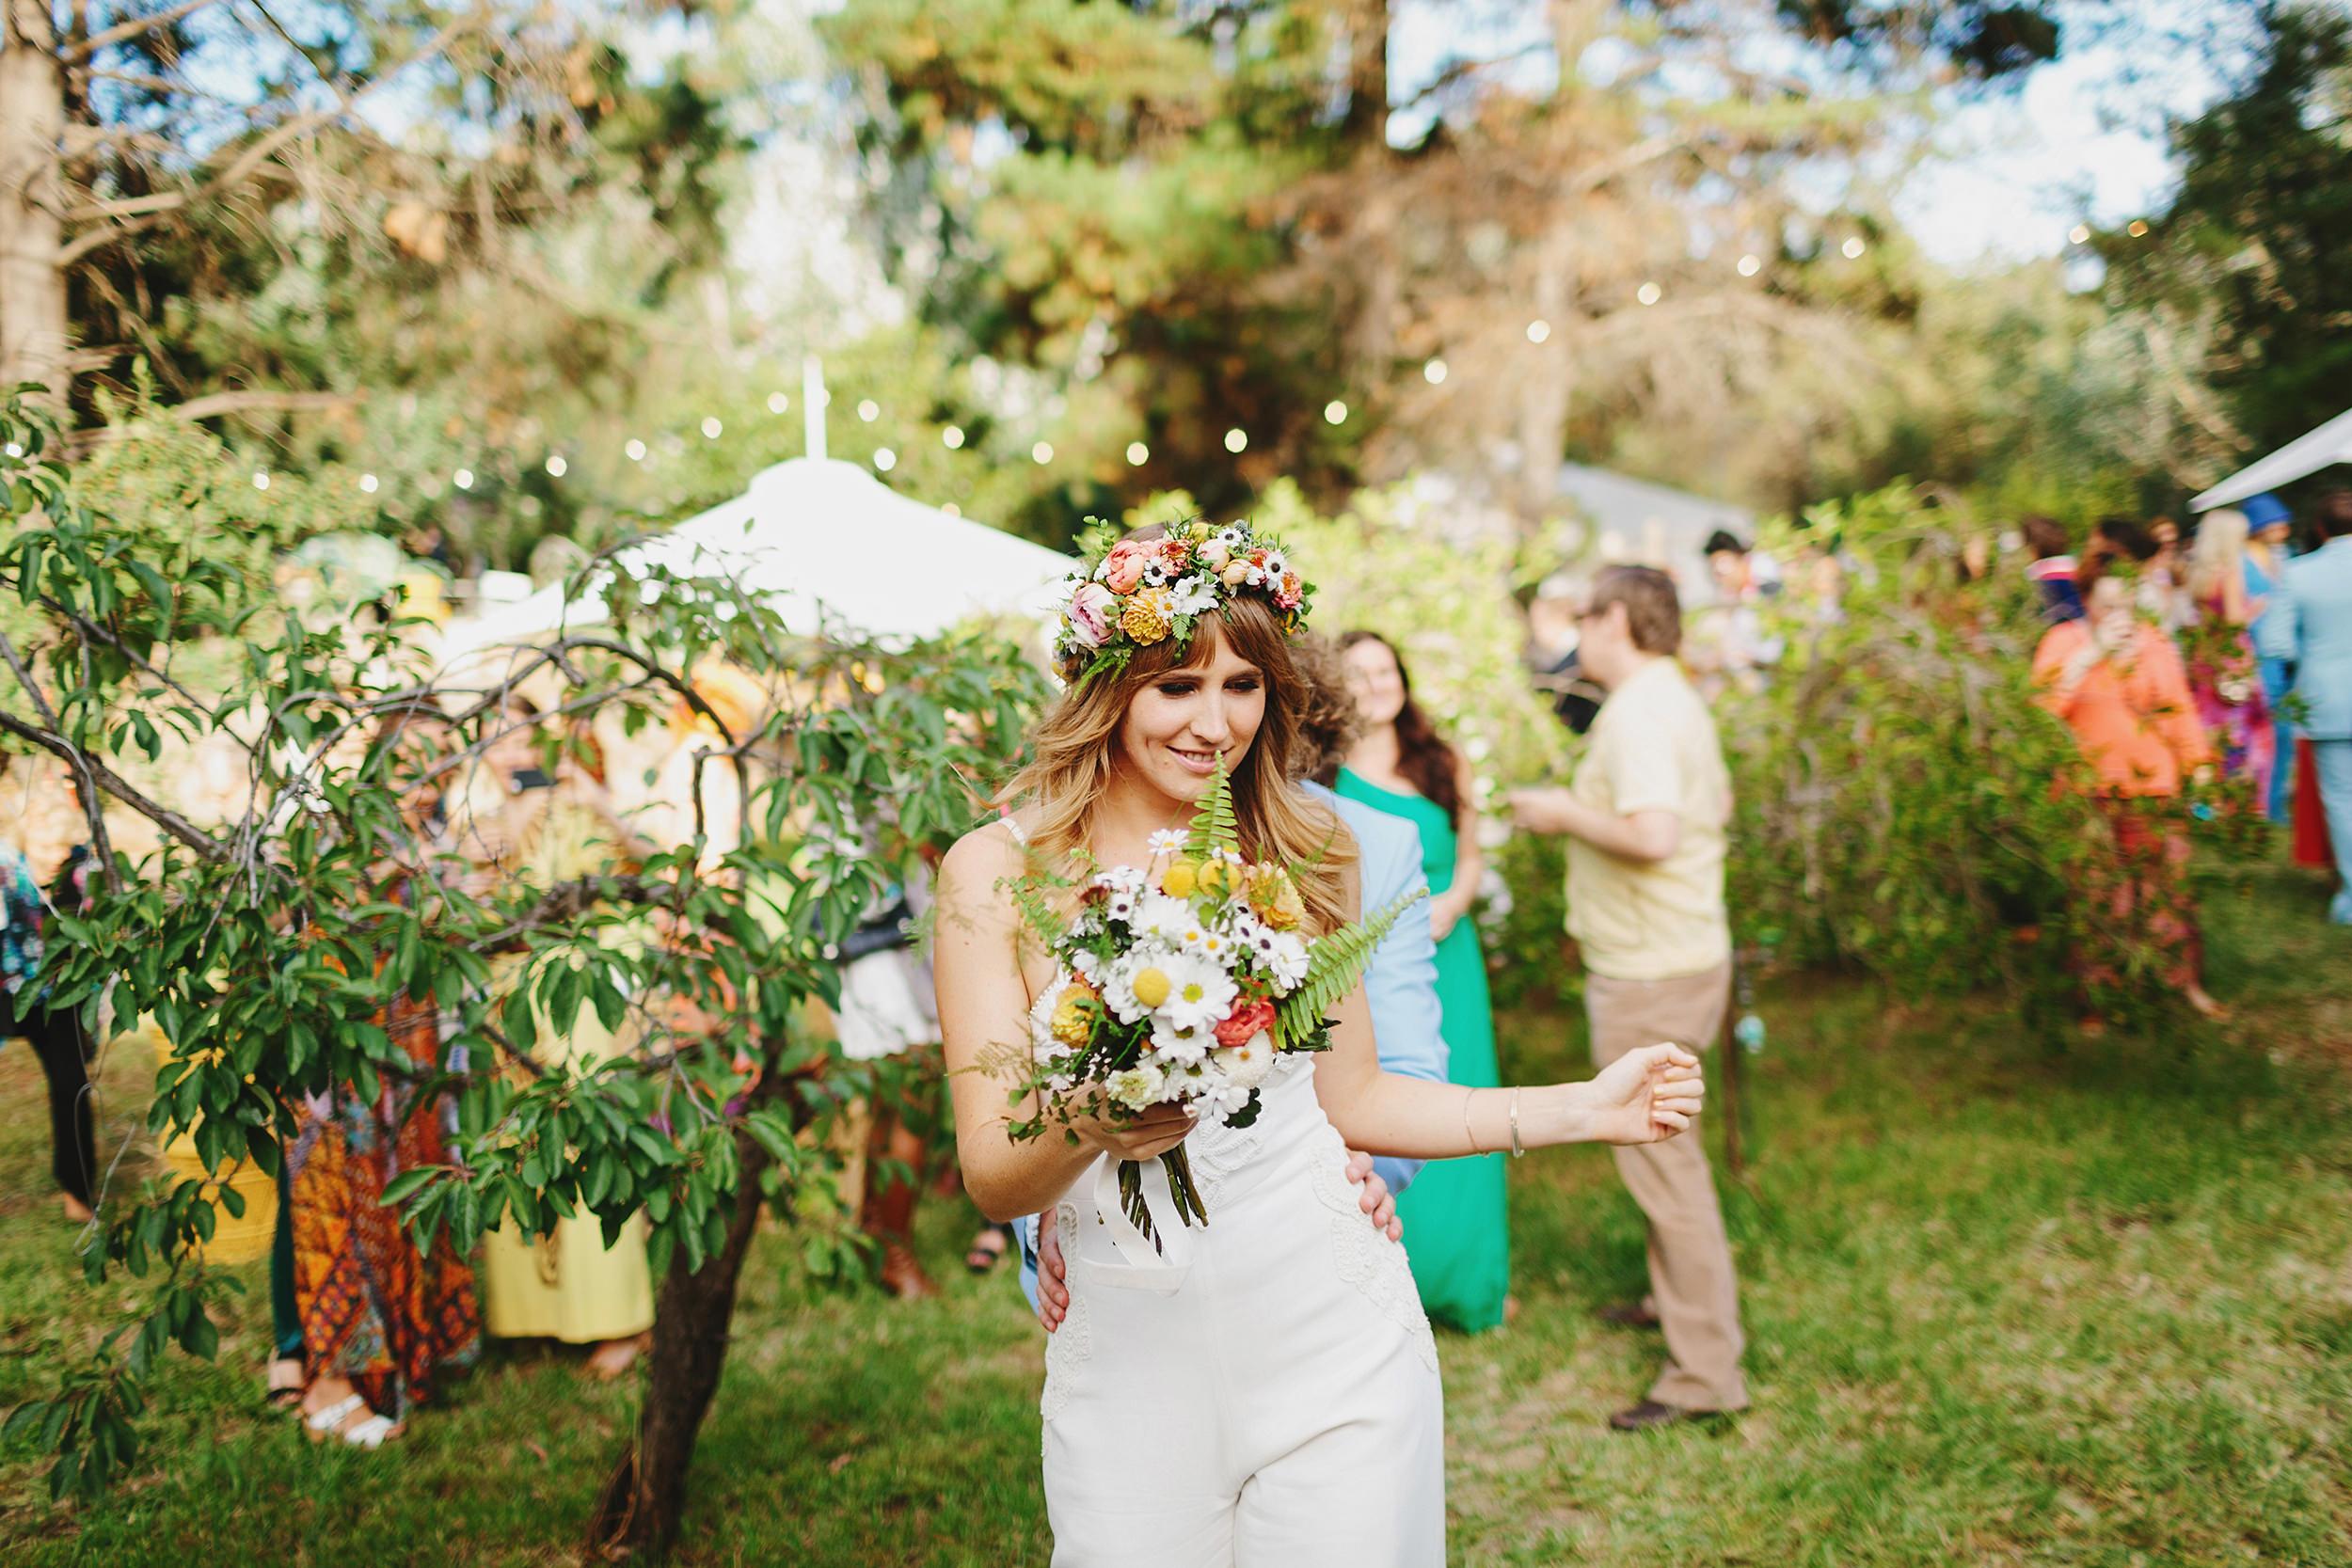 Melbourne_Vintage_Backyard_Wedding_Ben_Erin 061.JPG